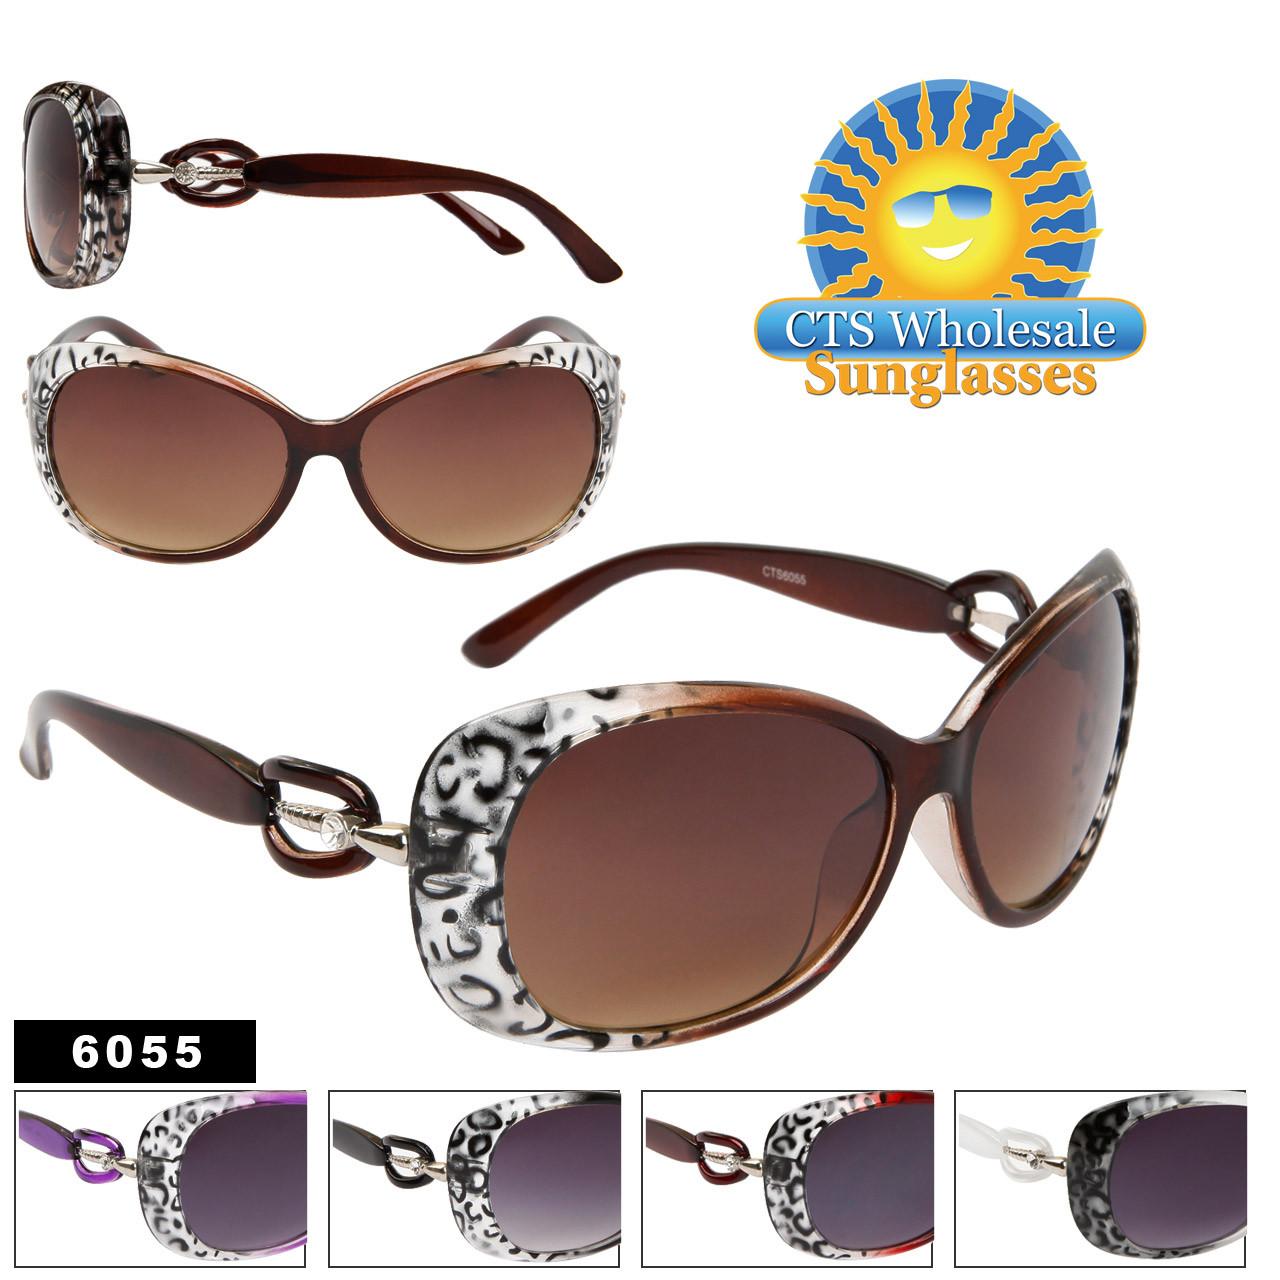 Rhinestone Sunglasses Wholesale 6055